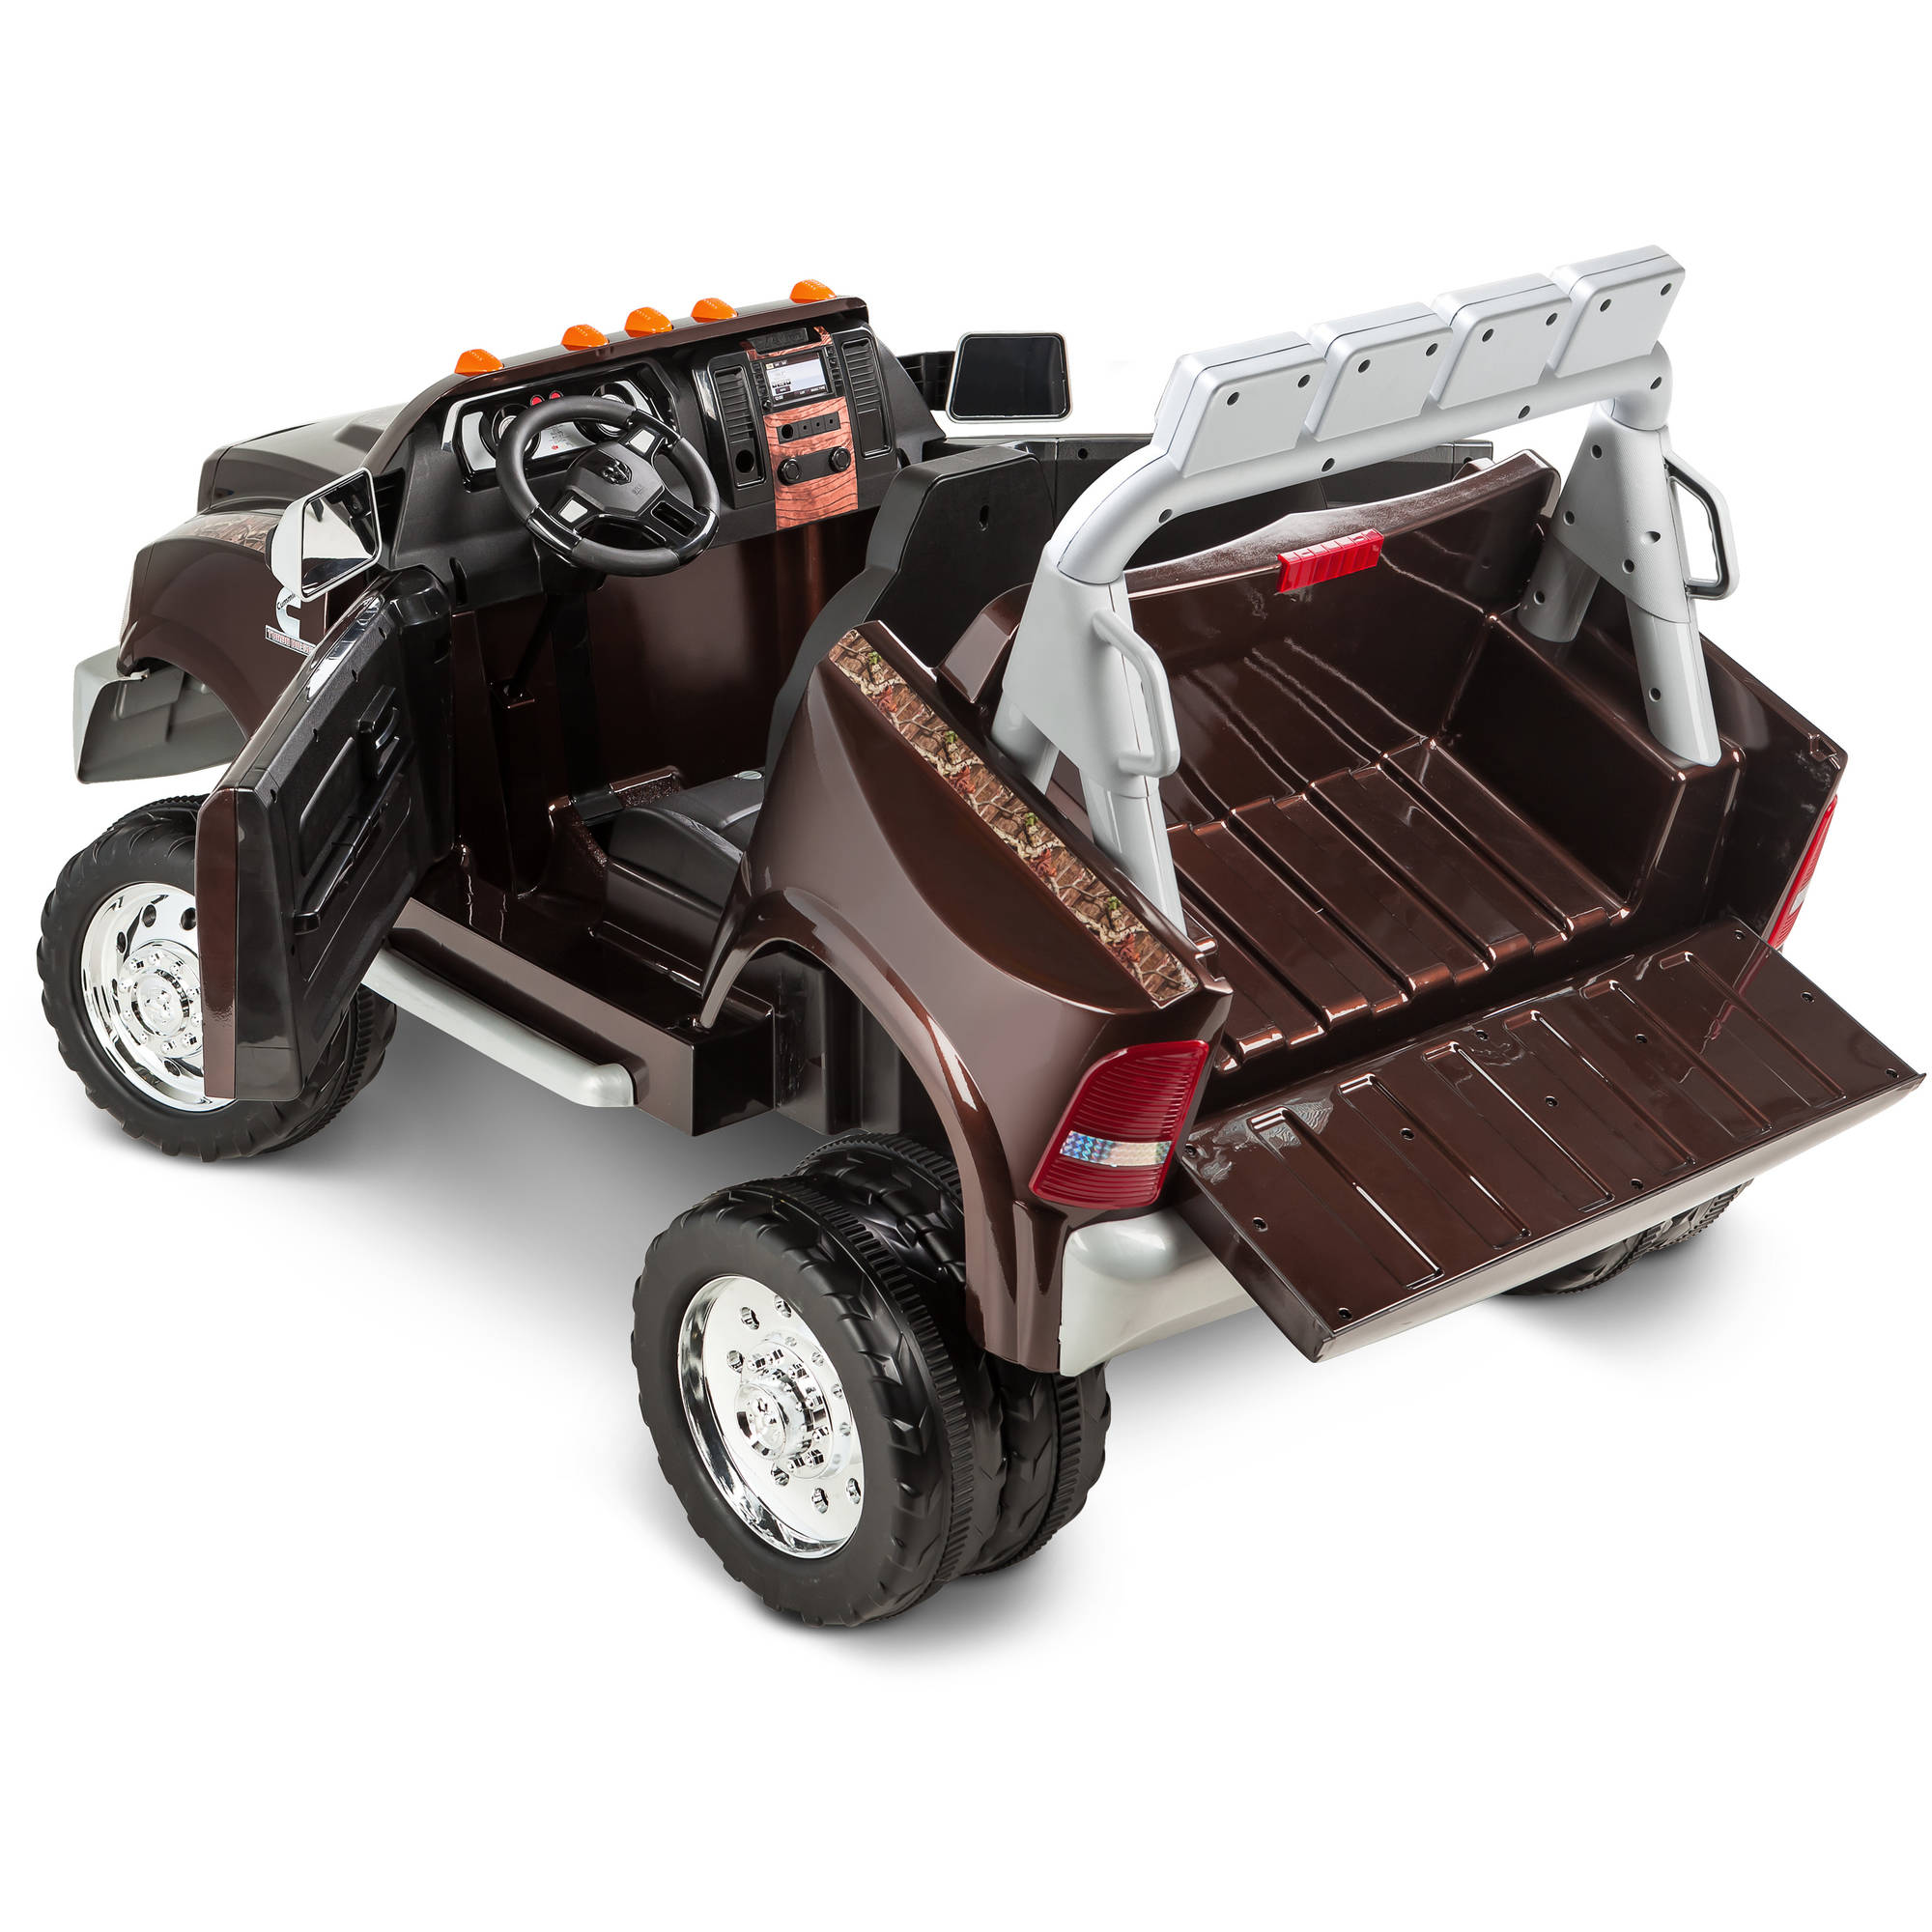 Kid Trax Mossy Oak Ram 3500 Dually 12v Battery Powered Ride On